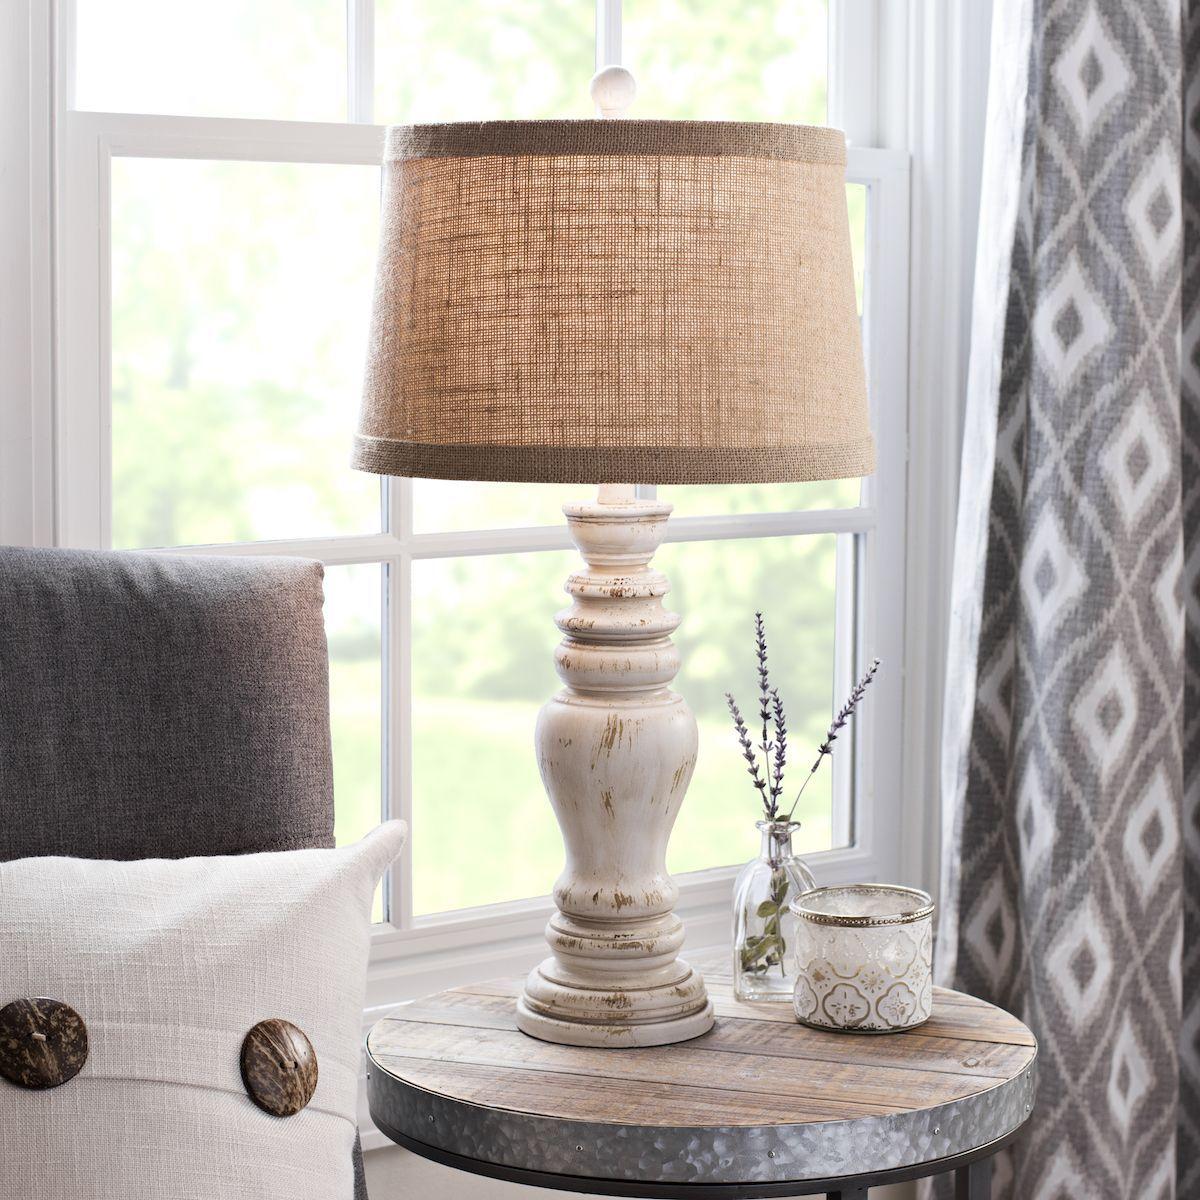 Rustic Distressed Cream Table Lamp in 2020 Farmhouse